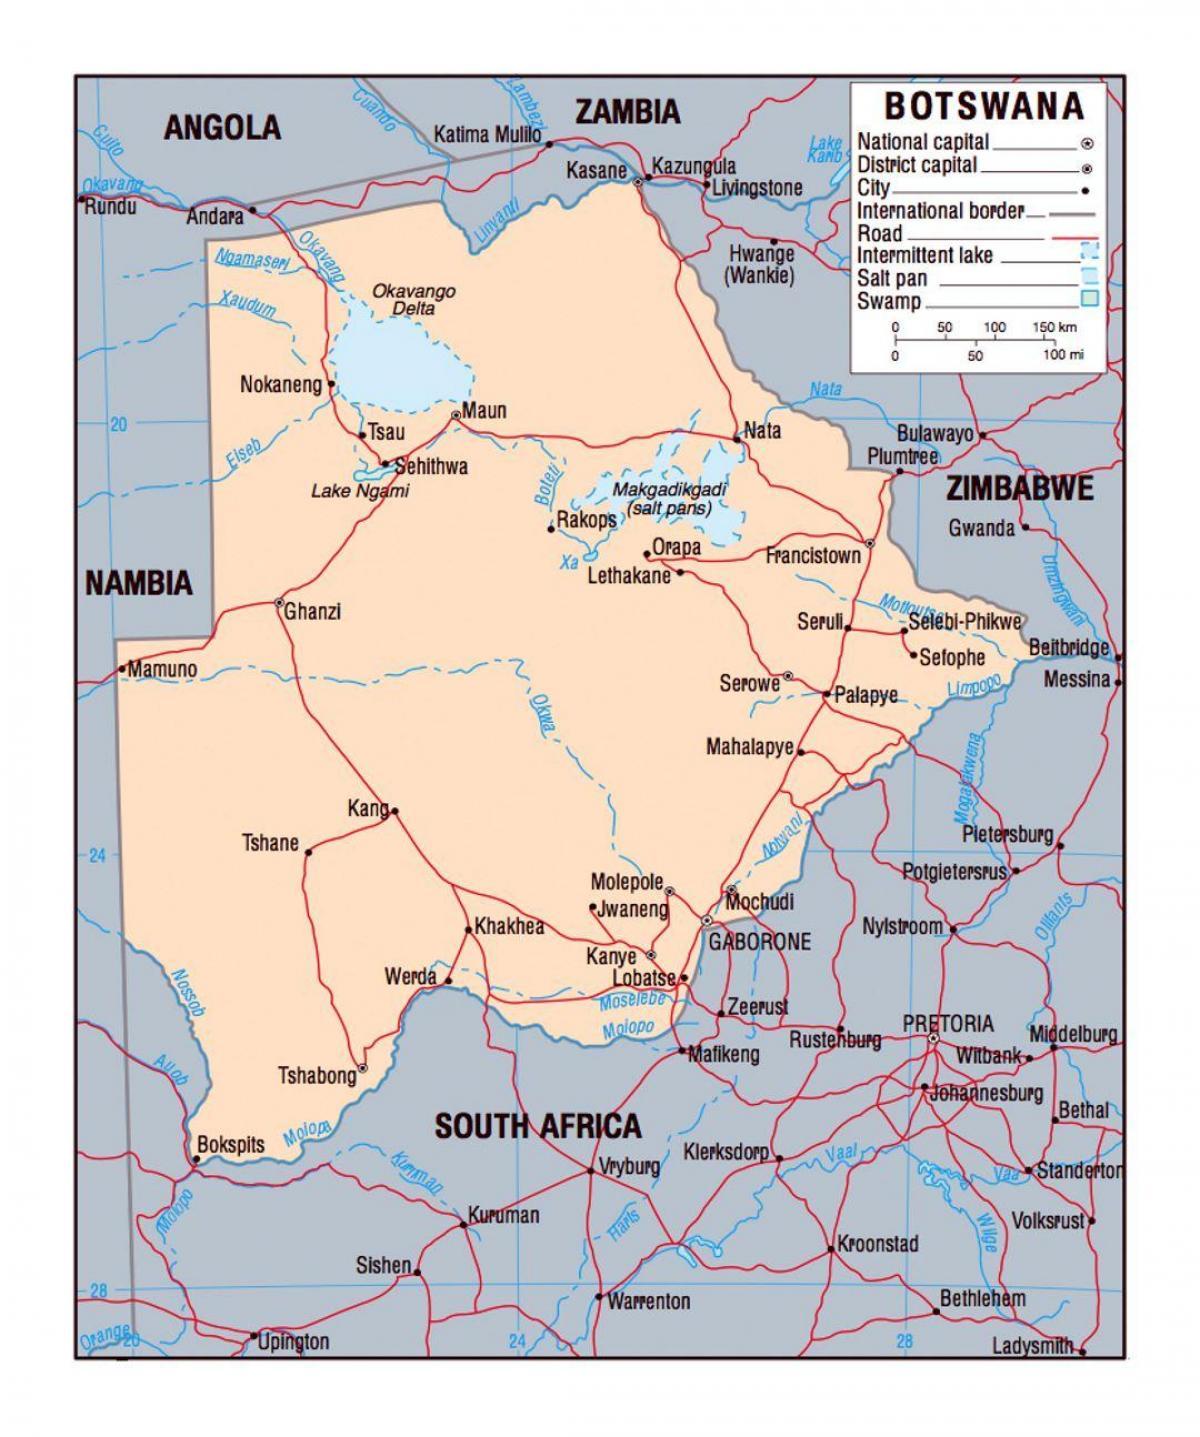 Botswana Political Map.Botswana Political Map Map Of Botswana Political Southern Africa